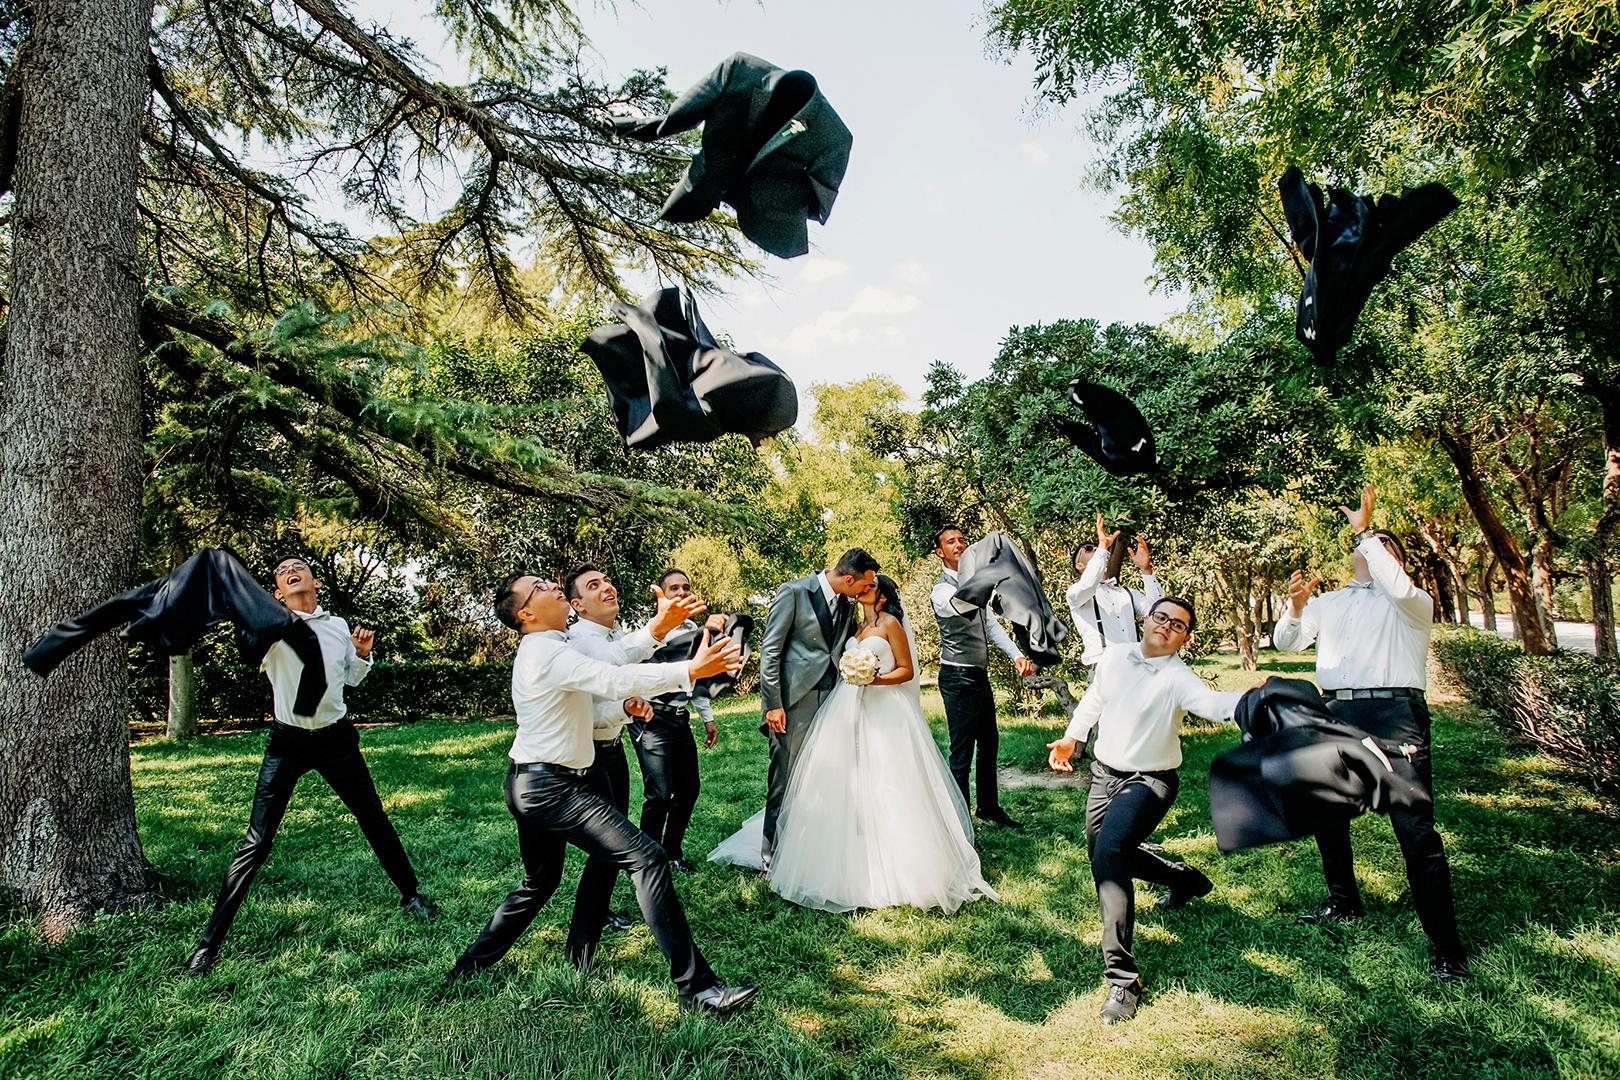 39 gianni-lepore-lucera-villa-wedding-matrimonio-damigelle-testimoni-famiglia-ritratto-fineart